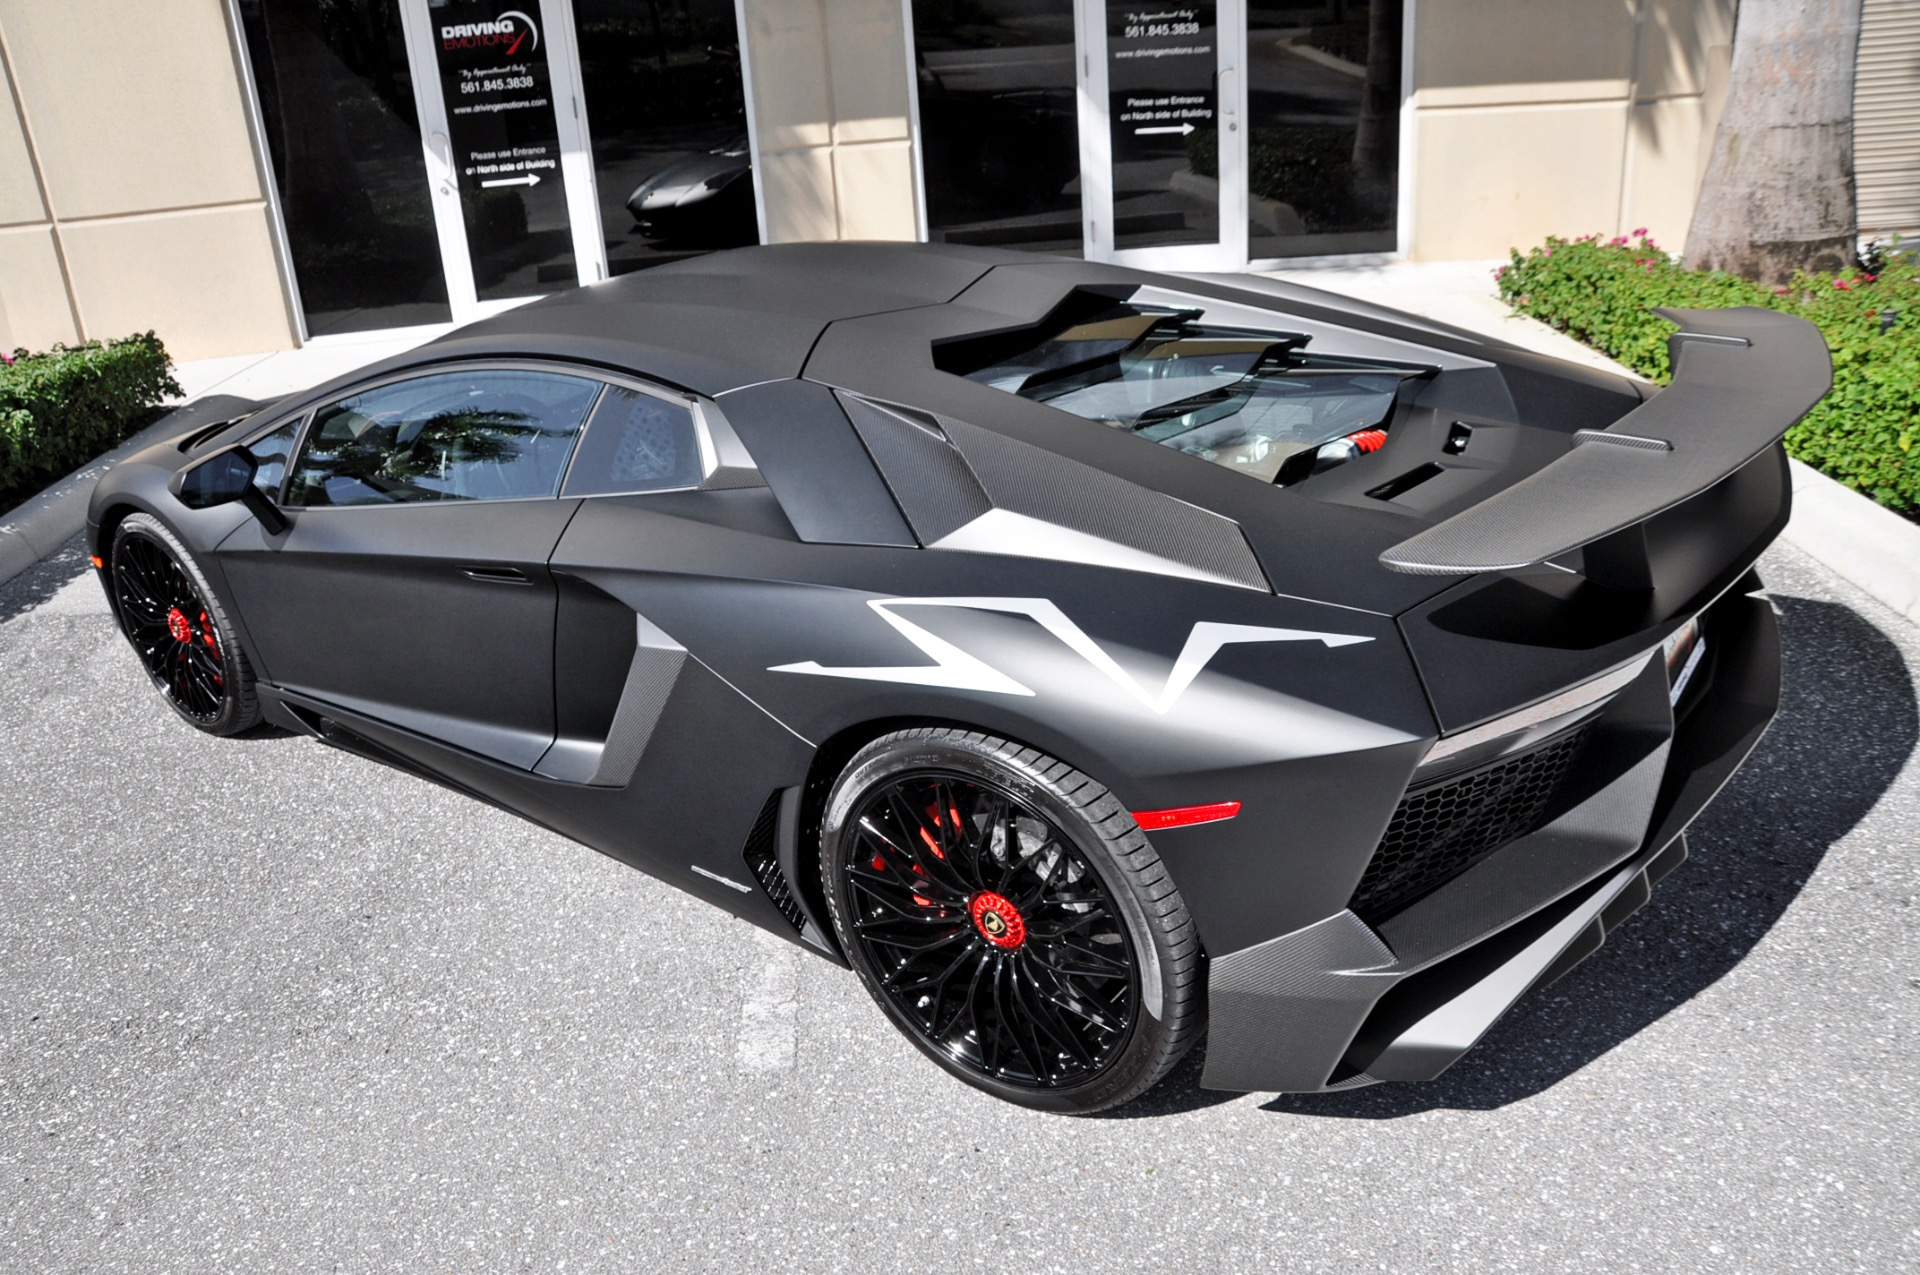 2016 Lamborghini Aventador SV LP750-4 Super Veloce LP 750